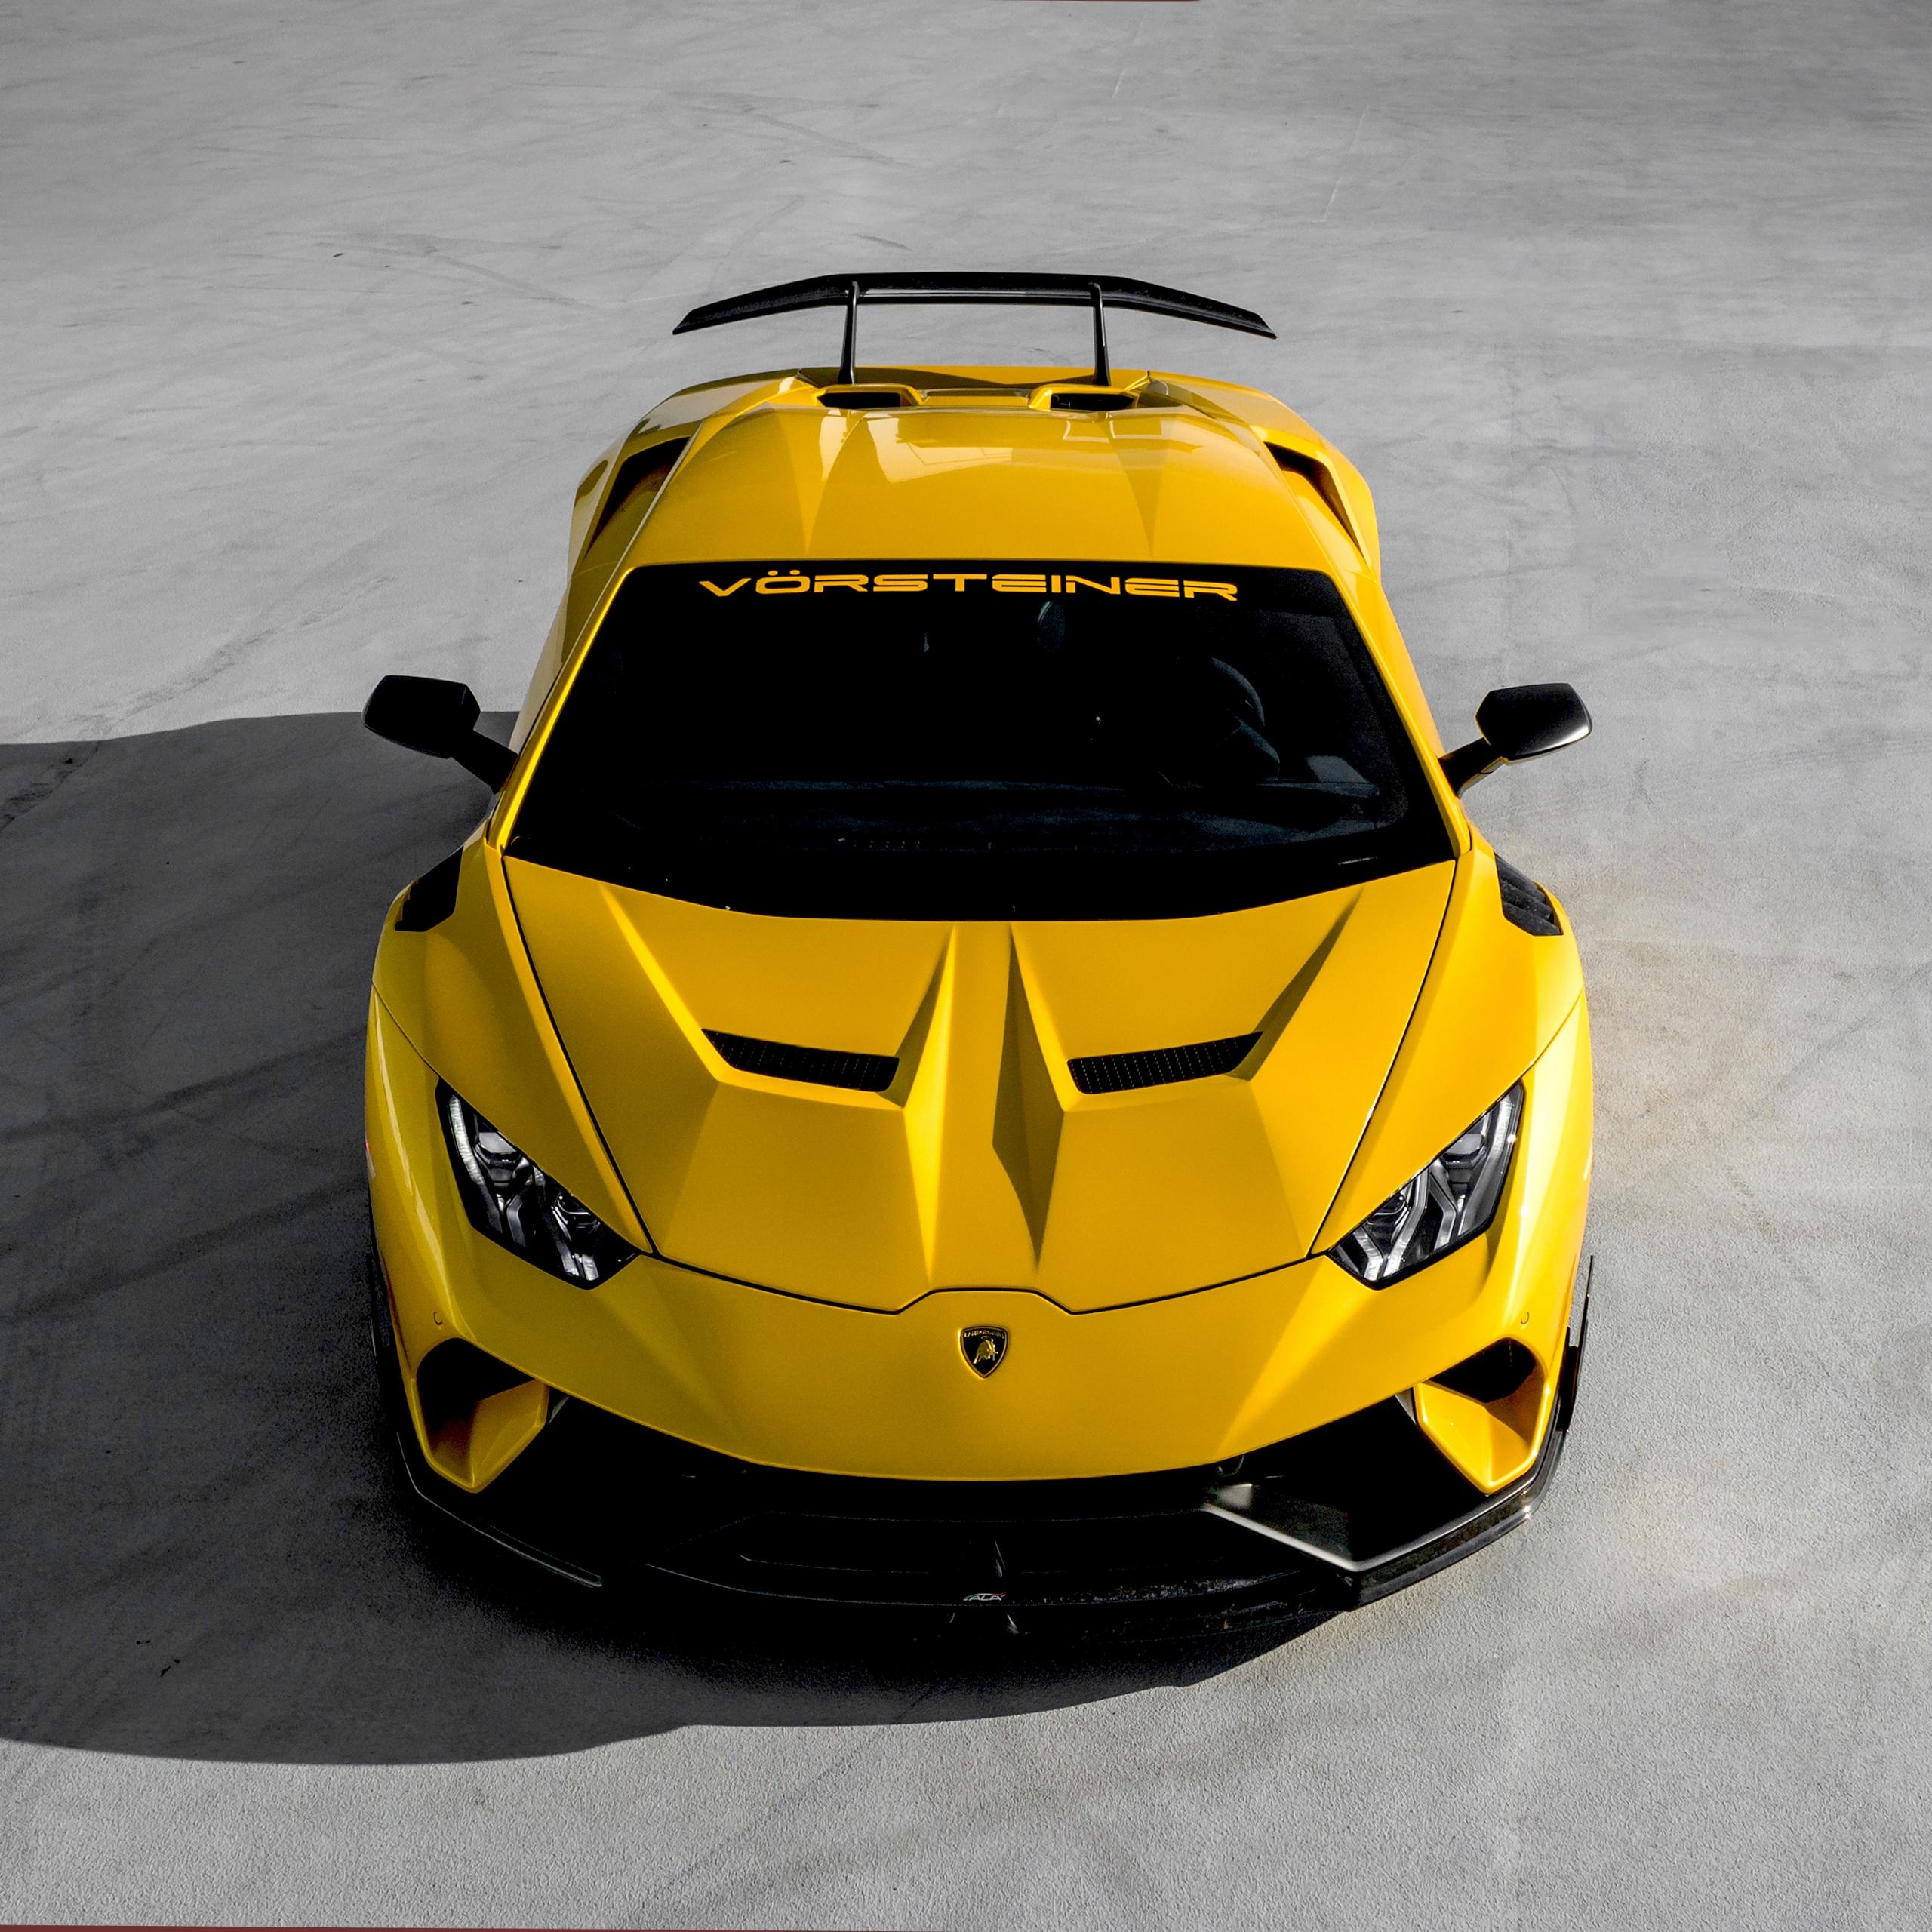 Ferrari F8 Tributo Wallpapers: Lamborghini Huracan 4K Wallpaper, Vorsteiner, Cars, #173